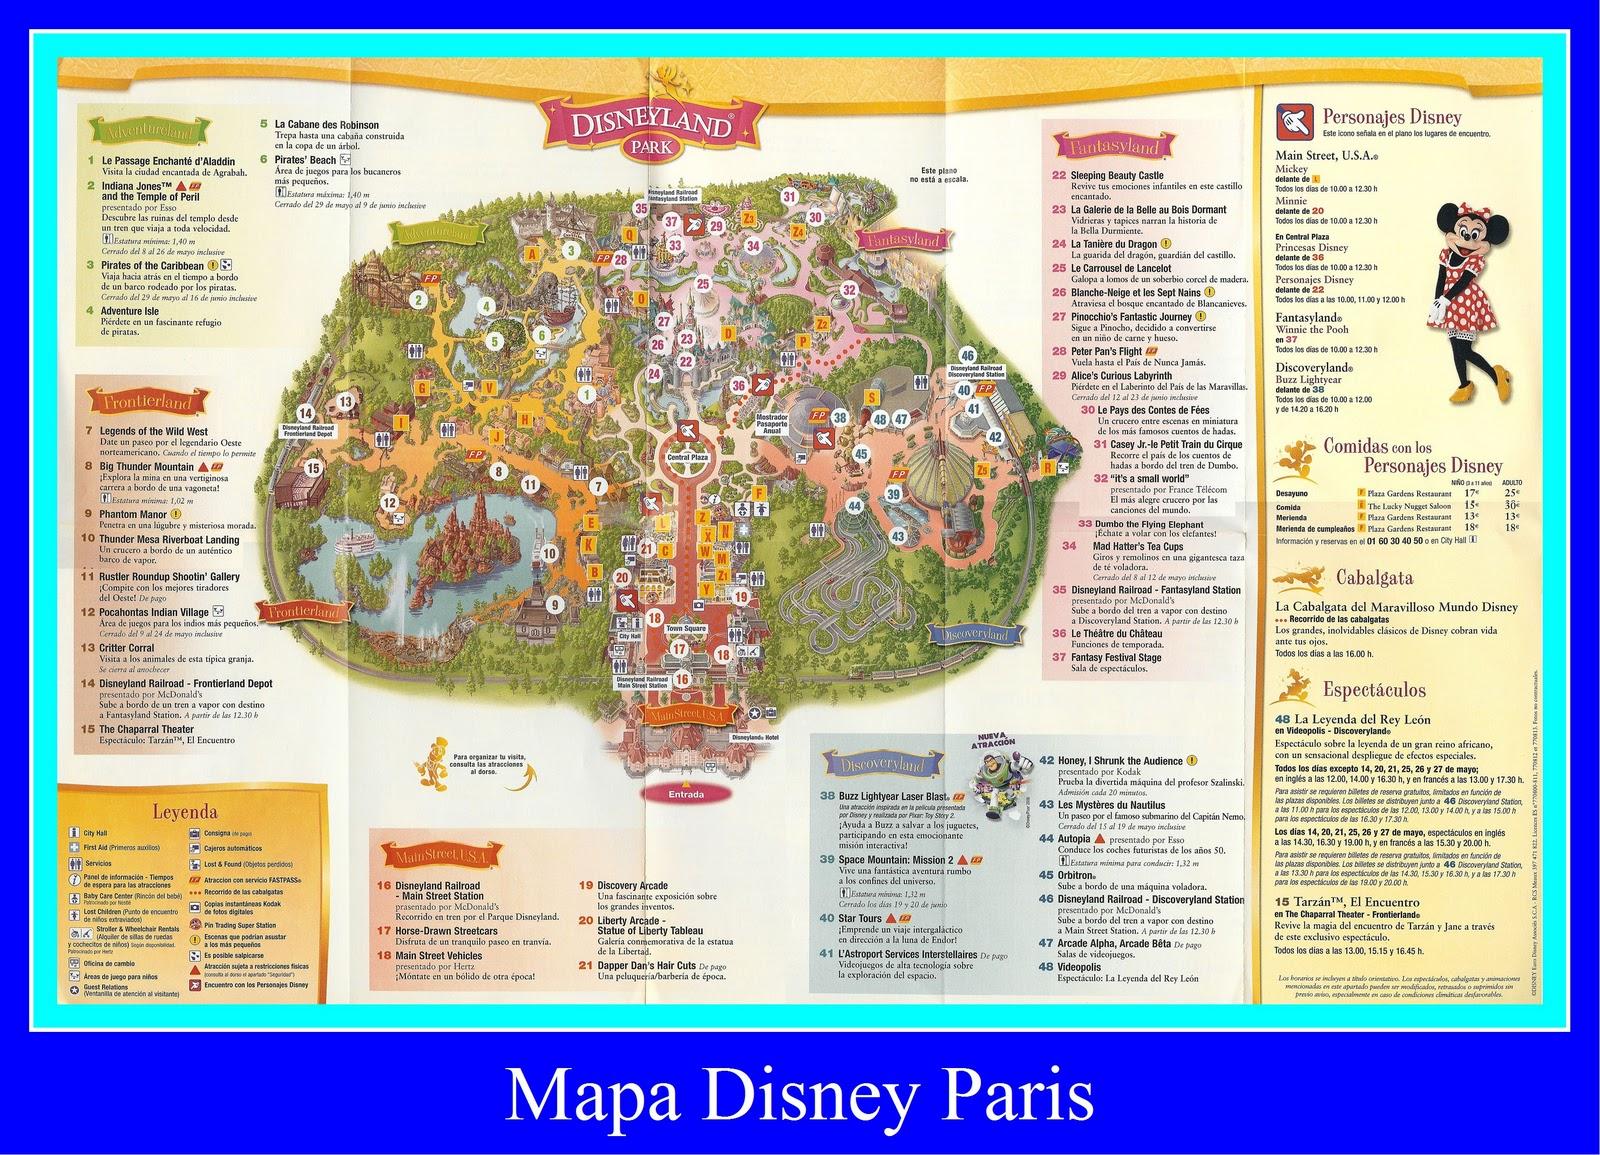 mapa disneyland paris 2011 RadioTundaka: Mapa Disneyland Paris mapa disneyland paris 2011